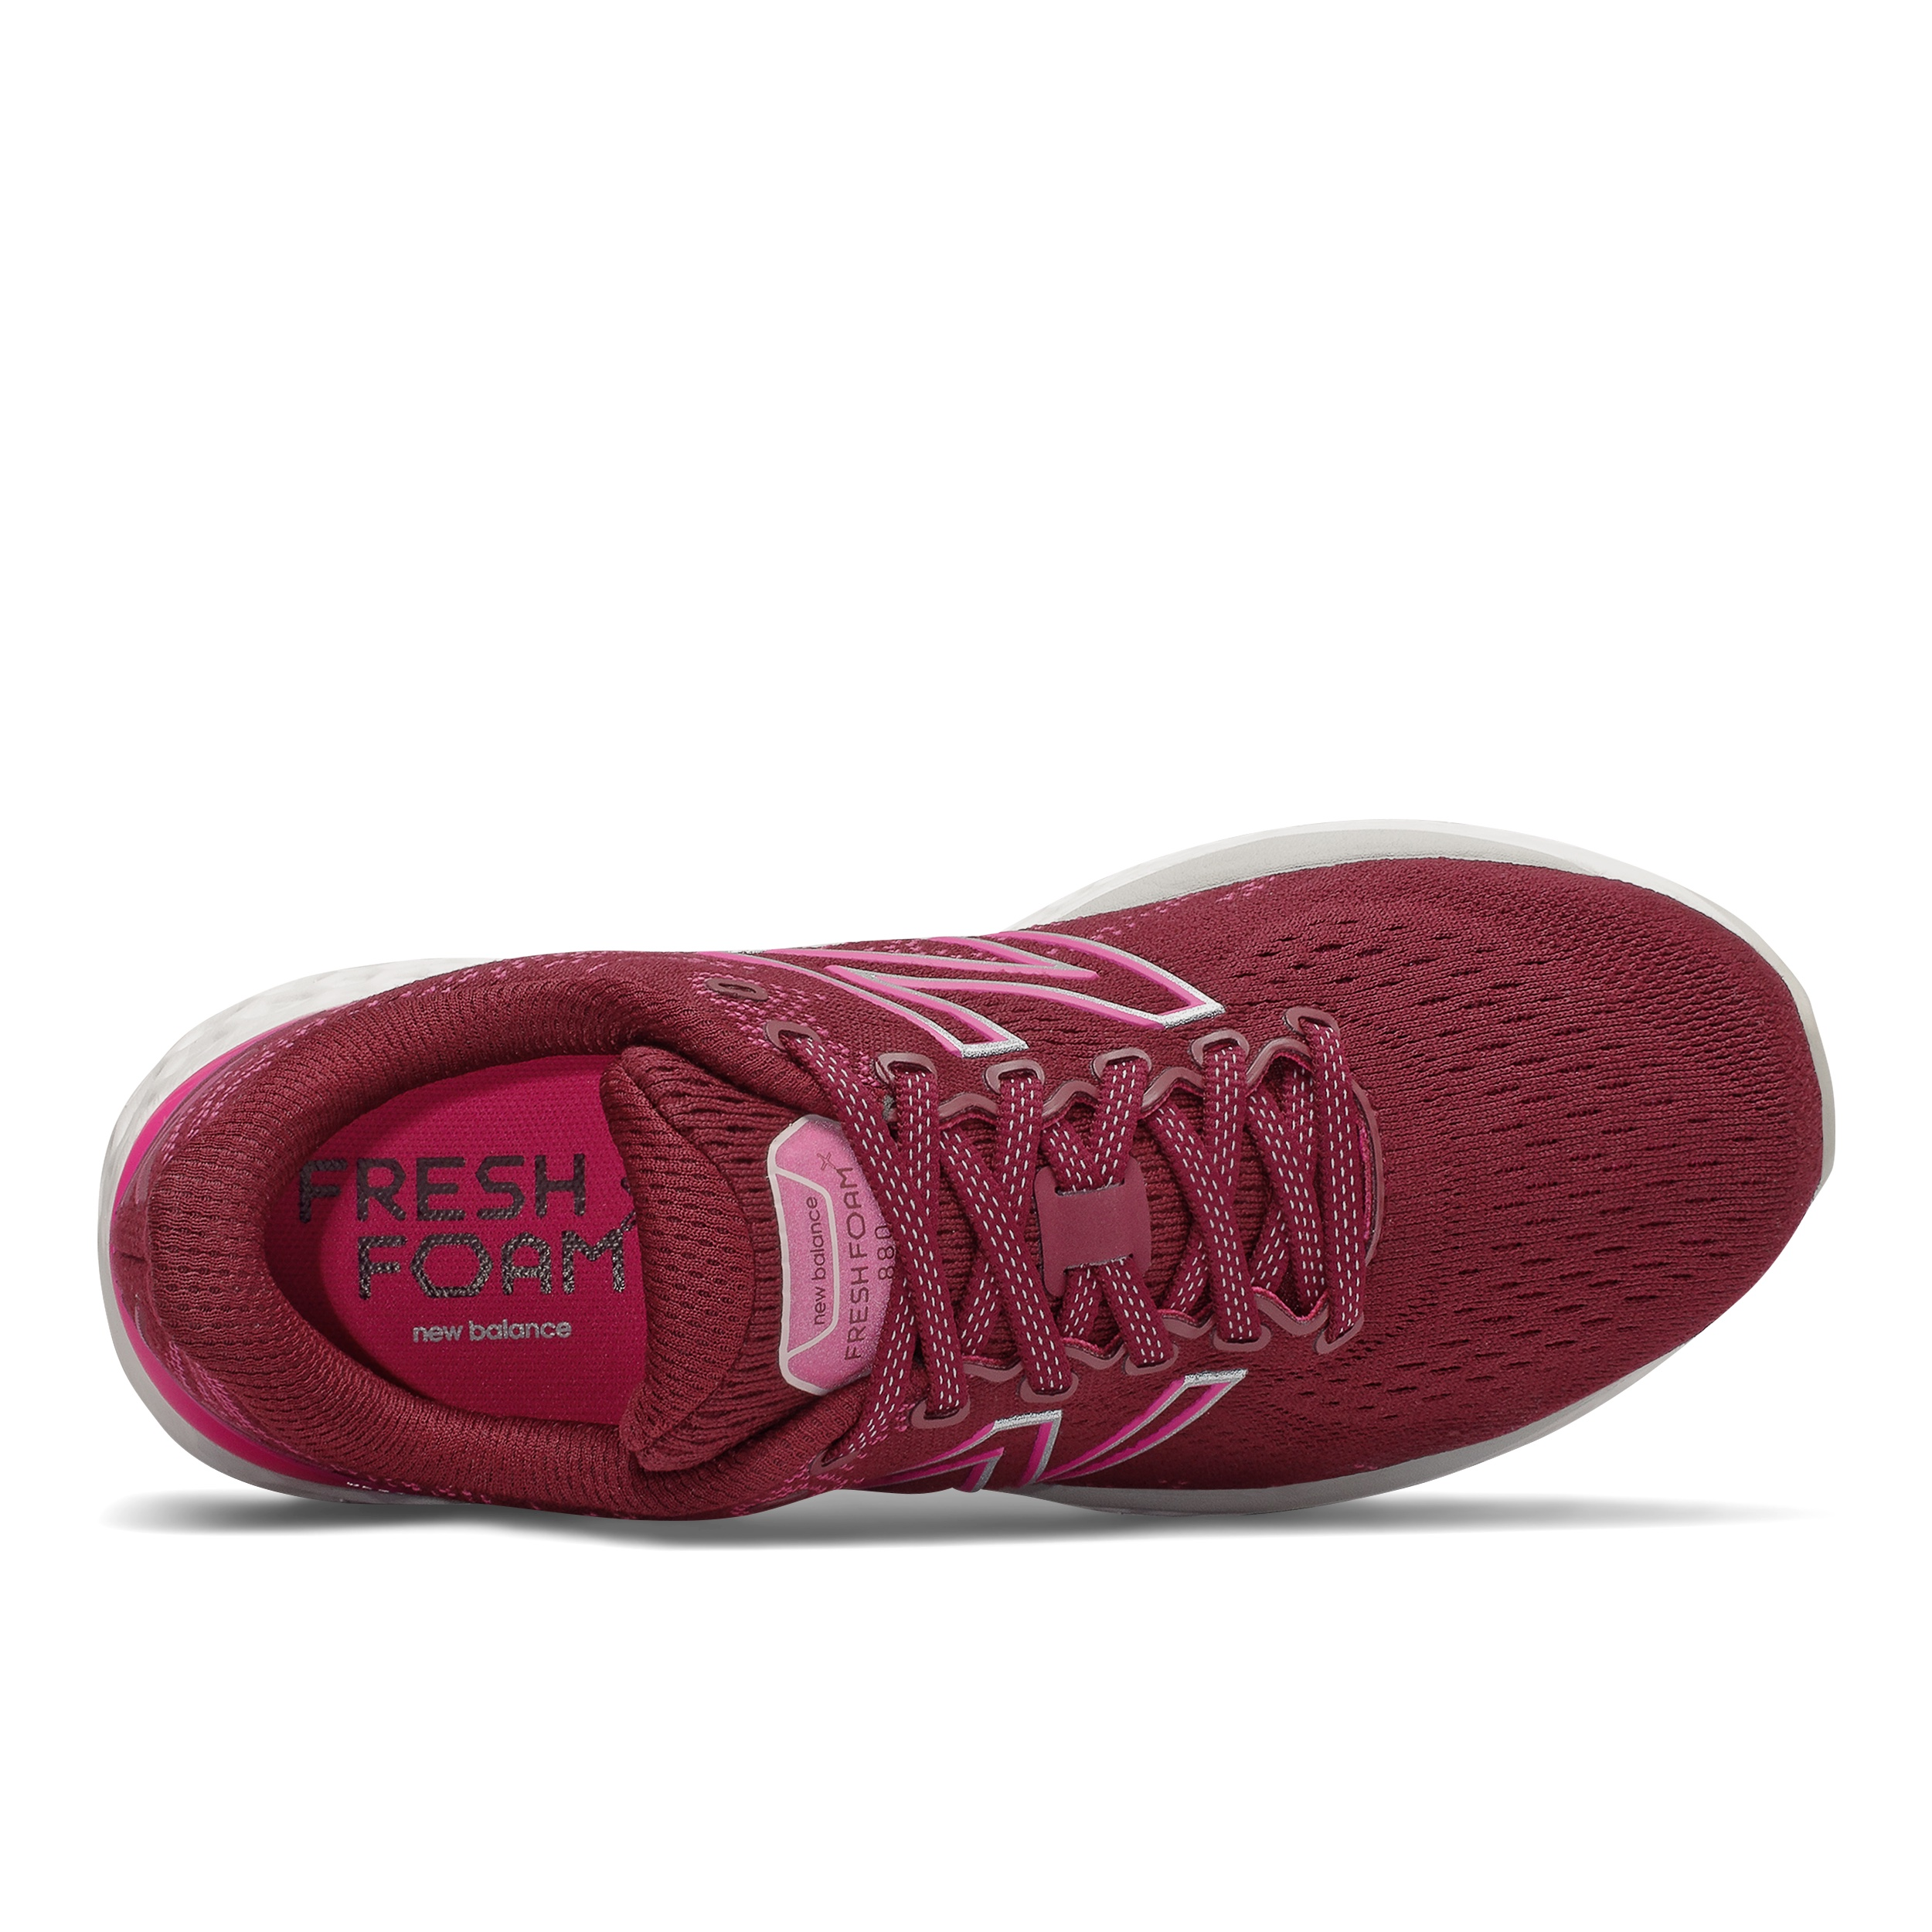 Women's New Balance 880V11 Running Shoe - Color: Garnet/Pink Glo - Size: 5 - Width: Narrow, Garnet/Pink Glo, large, image 3